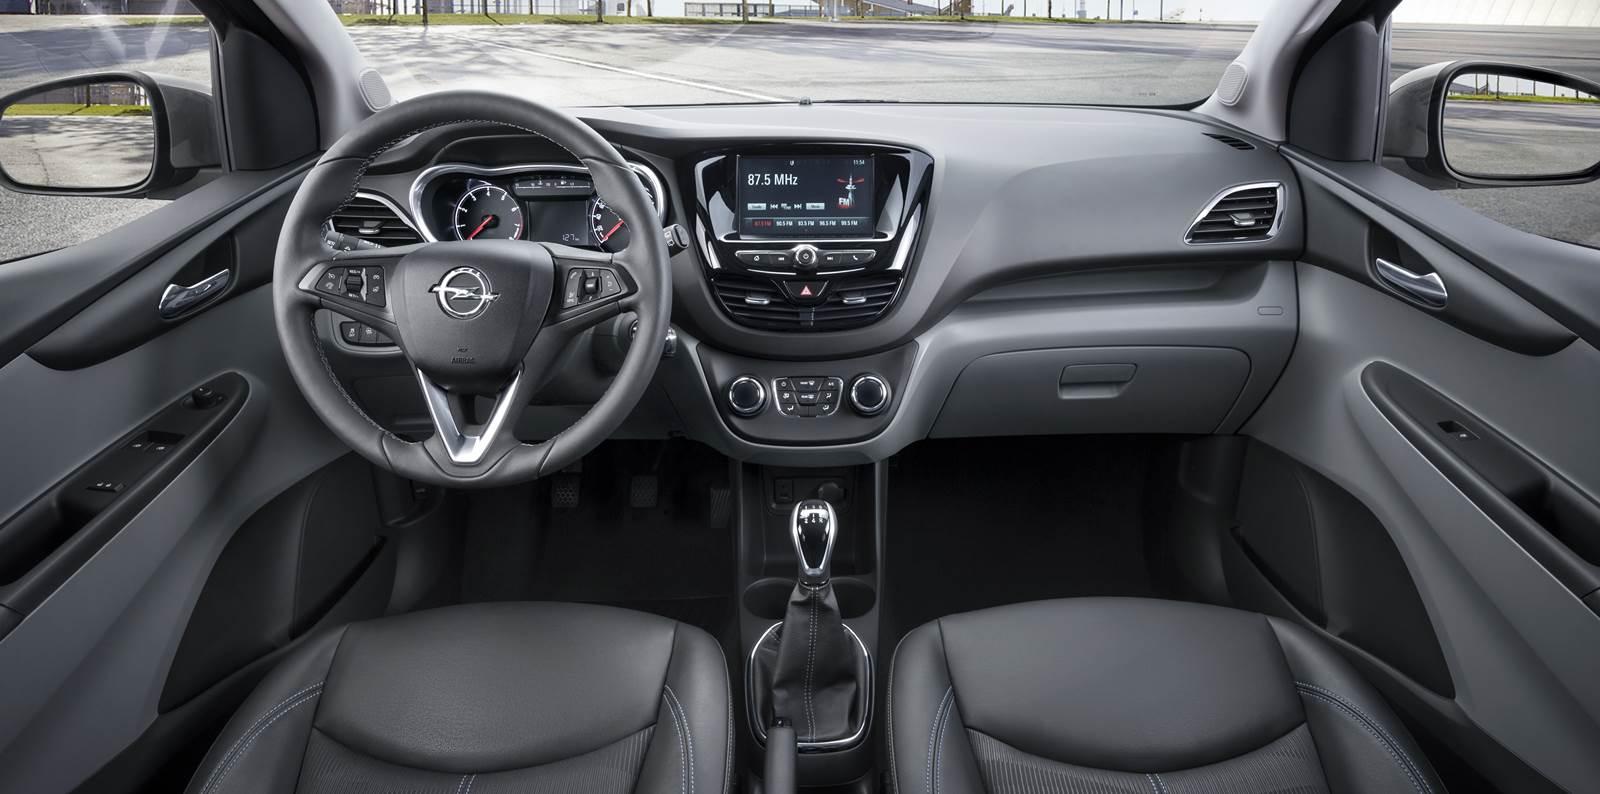 Opel Karl será mais barato que o Volkswagen up! na Alemanha